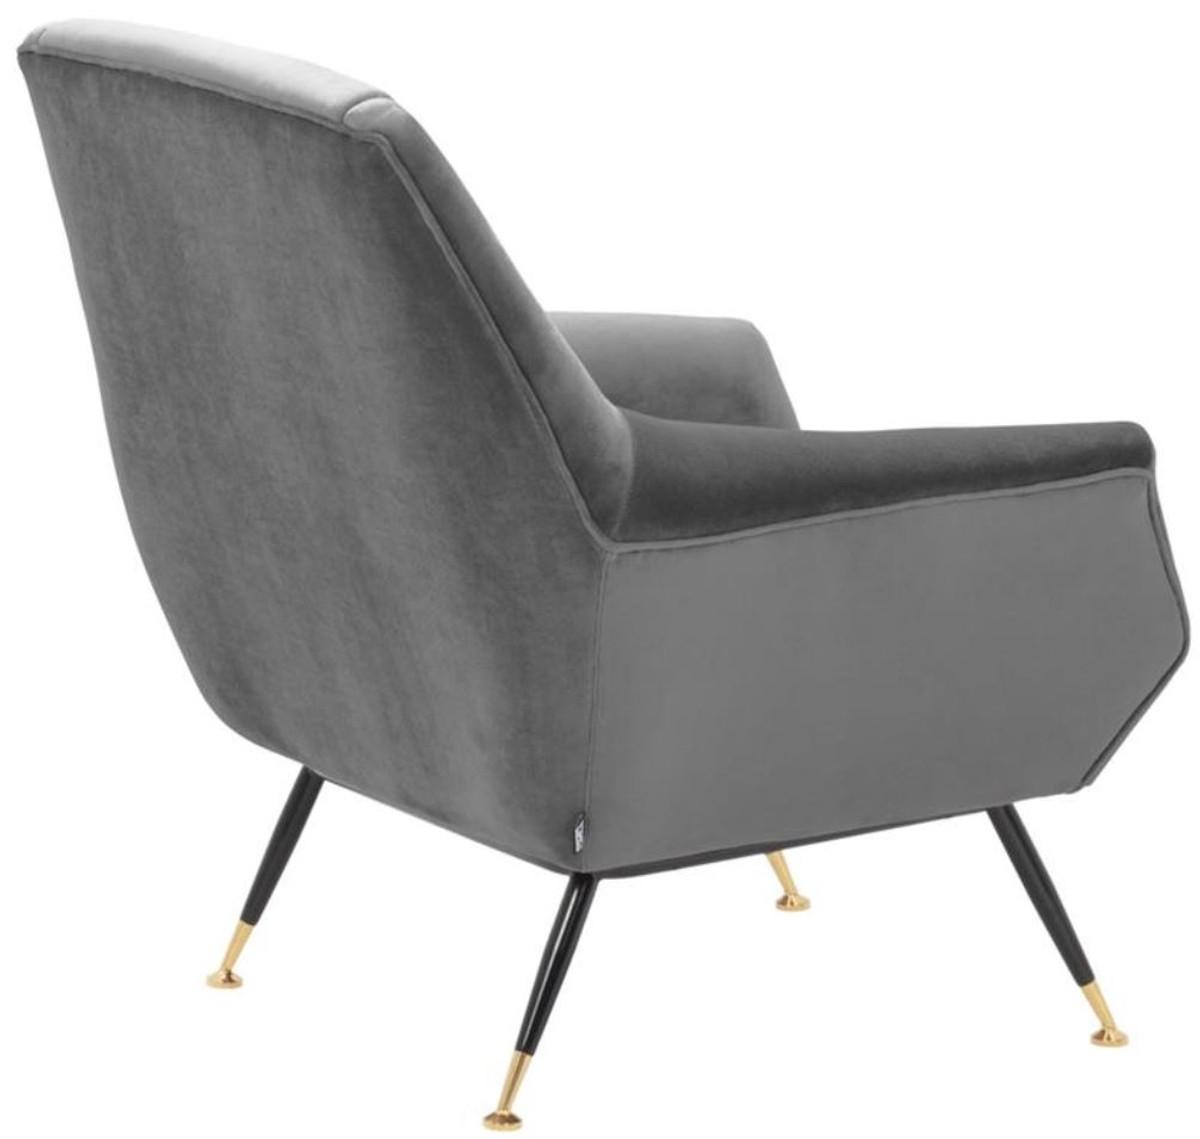 Casa Padrino Luxus Salon Sessel Grau / Schwarz / Messing 75 x 75 x H. 78 cm - Hotel Möbel 4